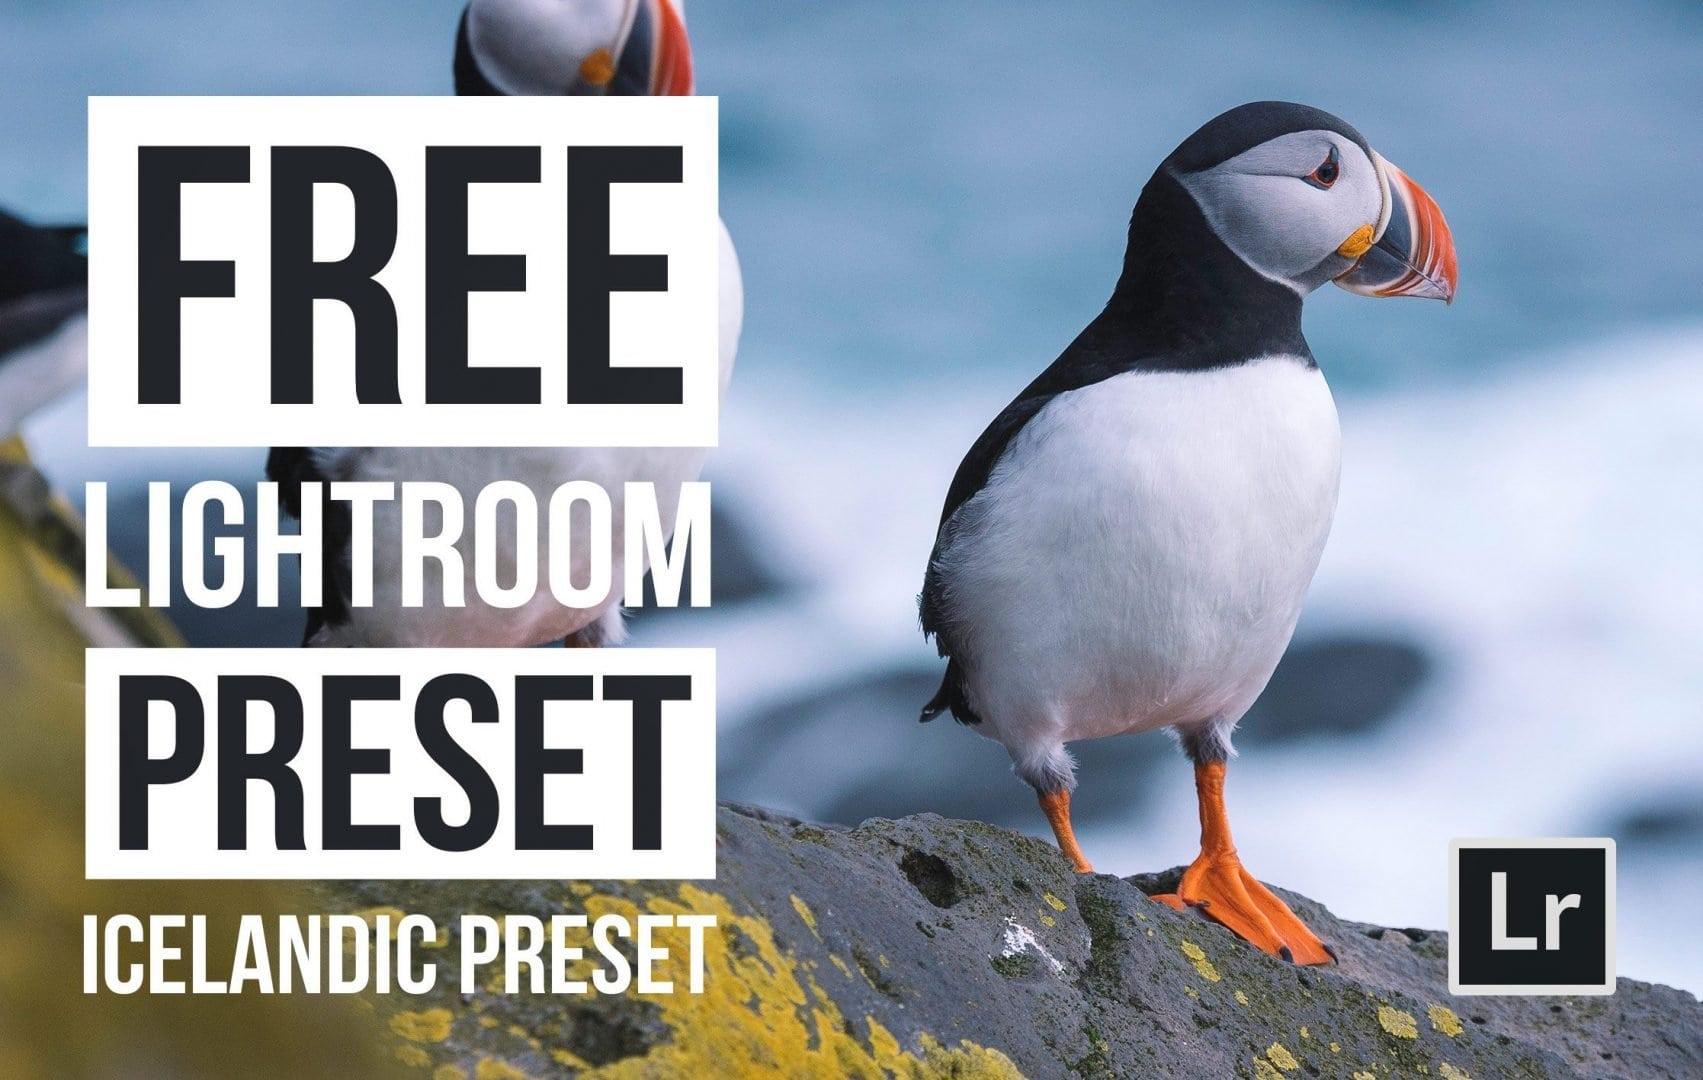 Free-Lightroom-Preset-Icelandic-Cover-Presetpro.com